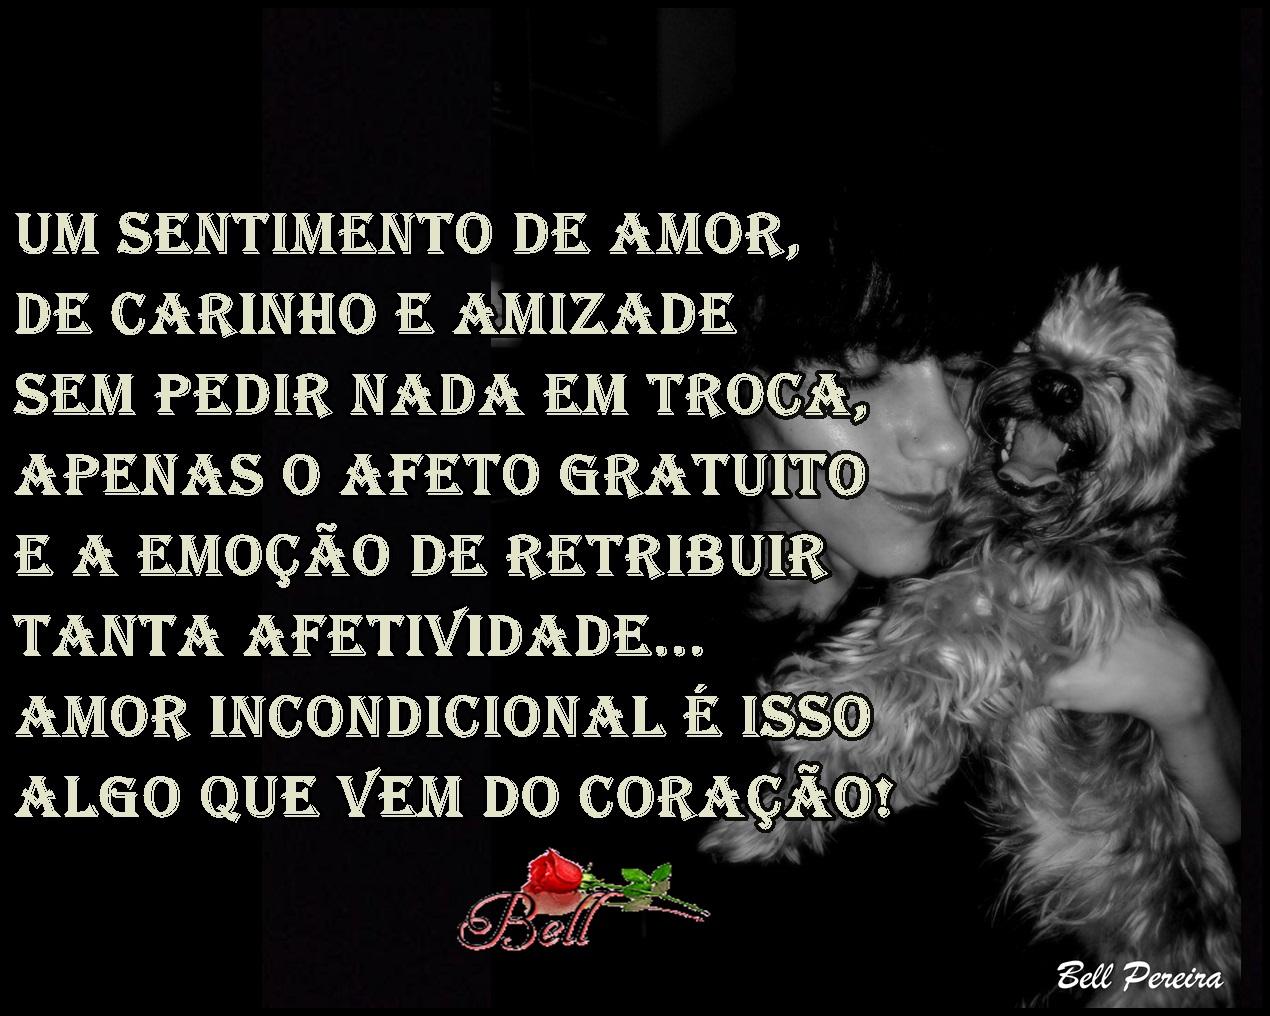 Frases De Amor Incondicional 3 A: Frases Amor Incondicional Animal